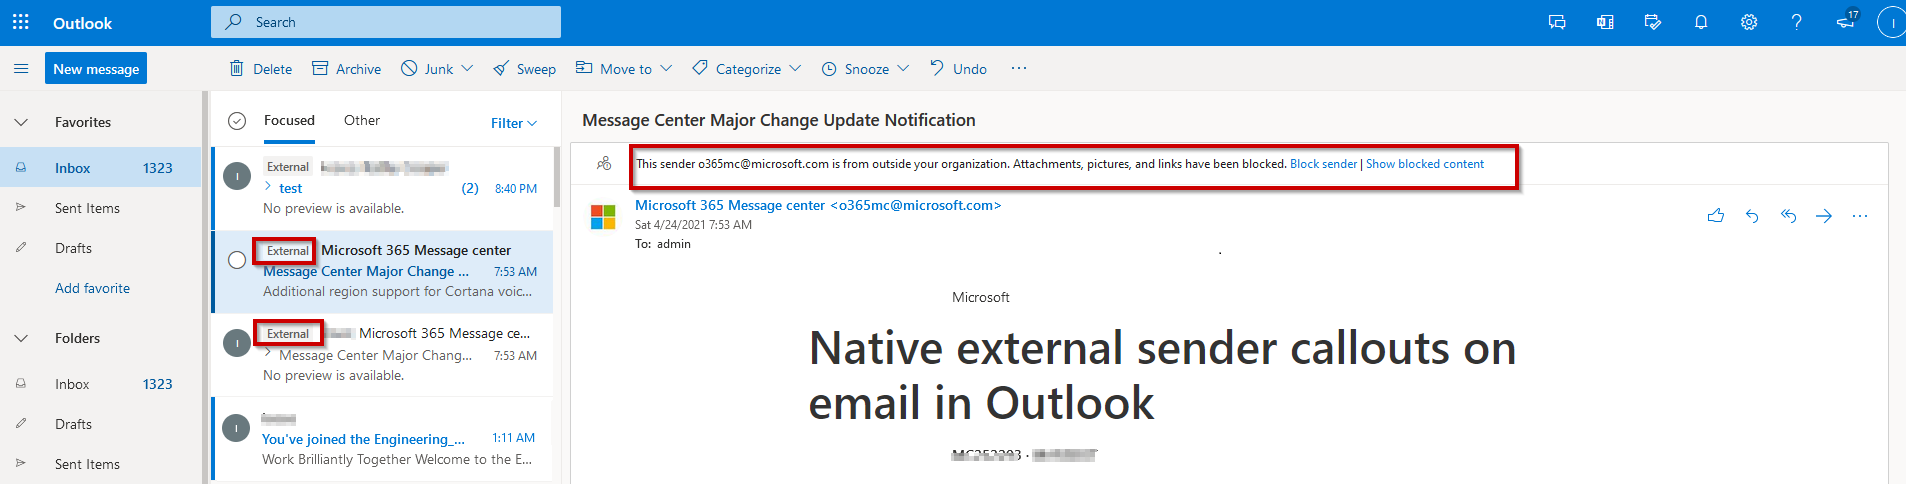 External email warning